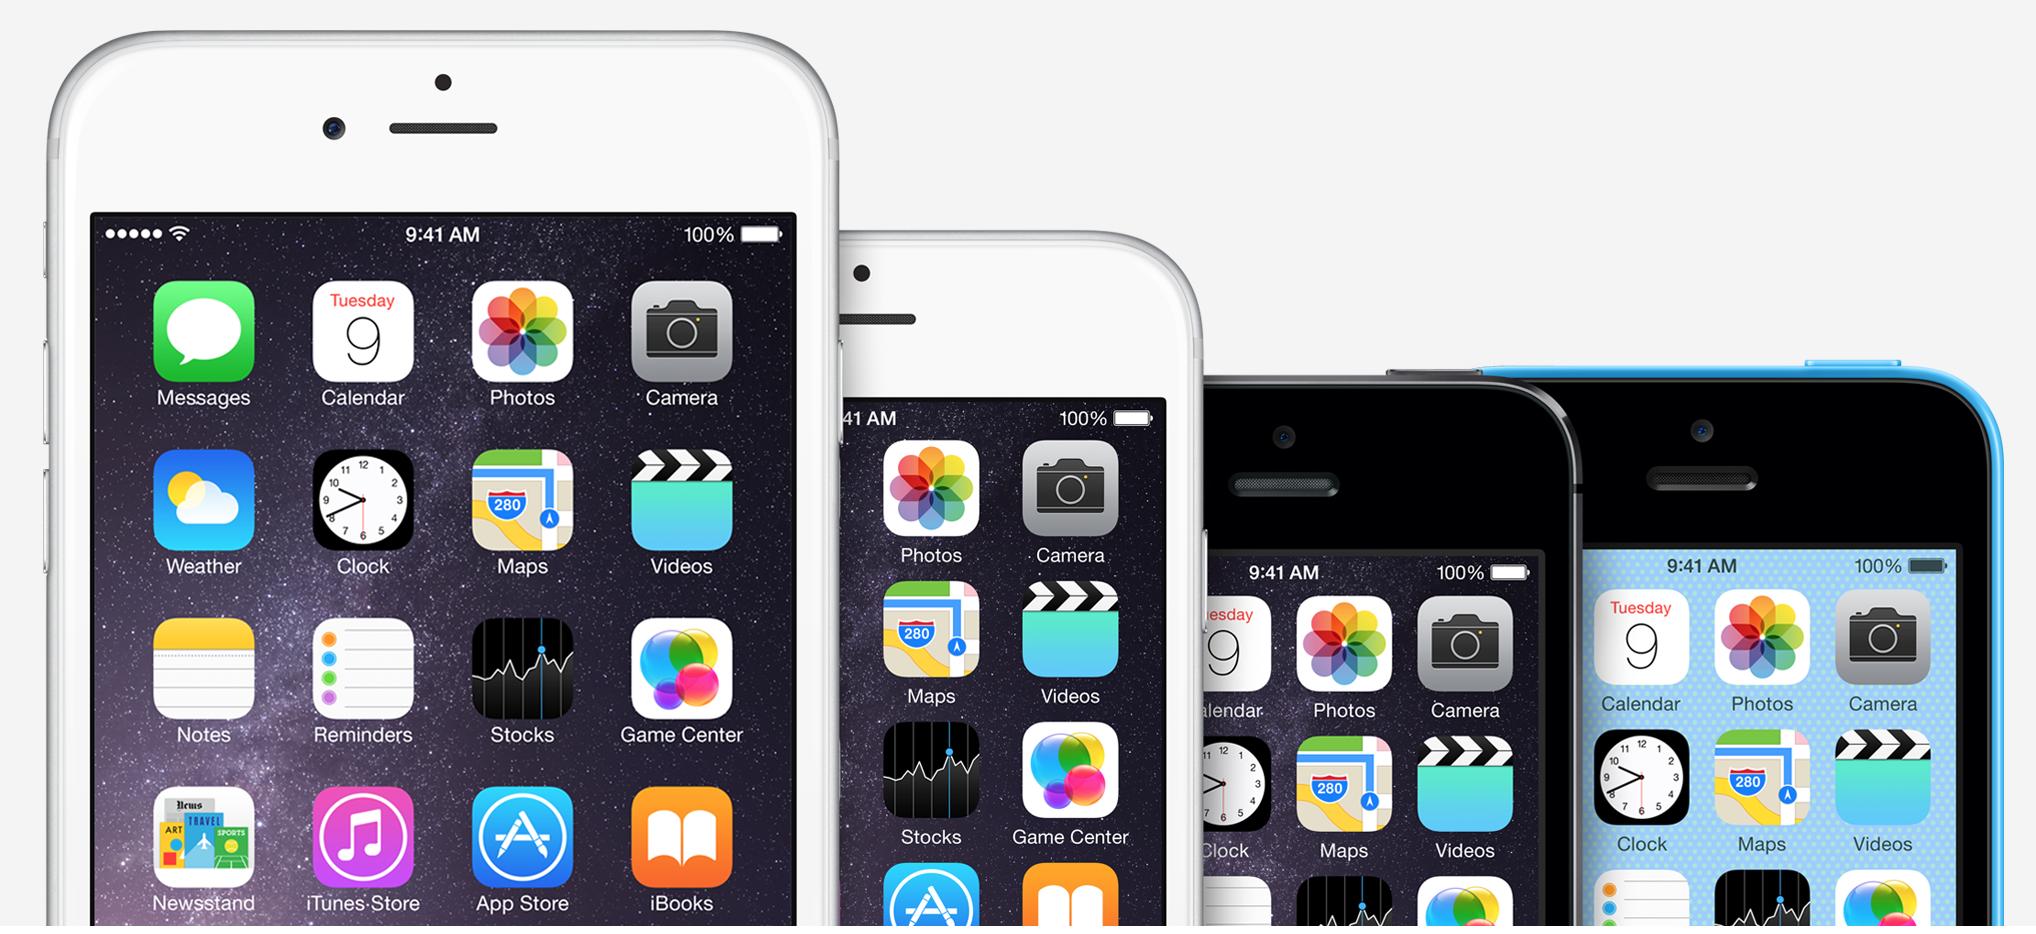 Screenshot 2015-08-27 08.42.58